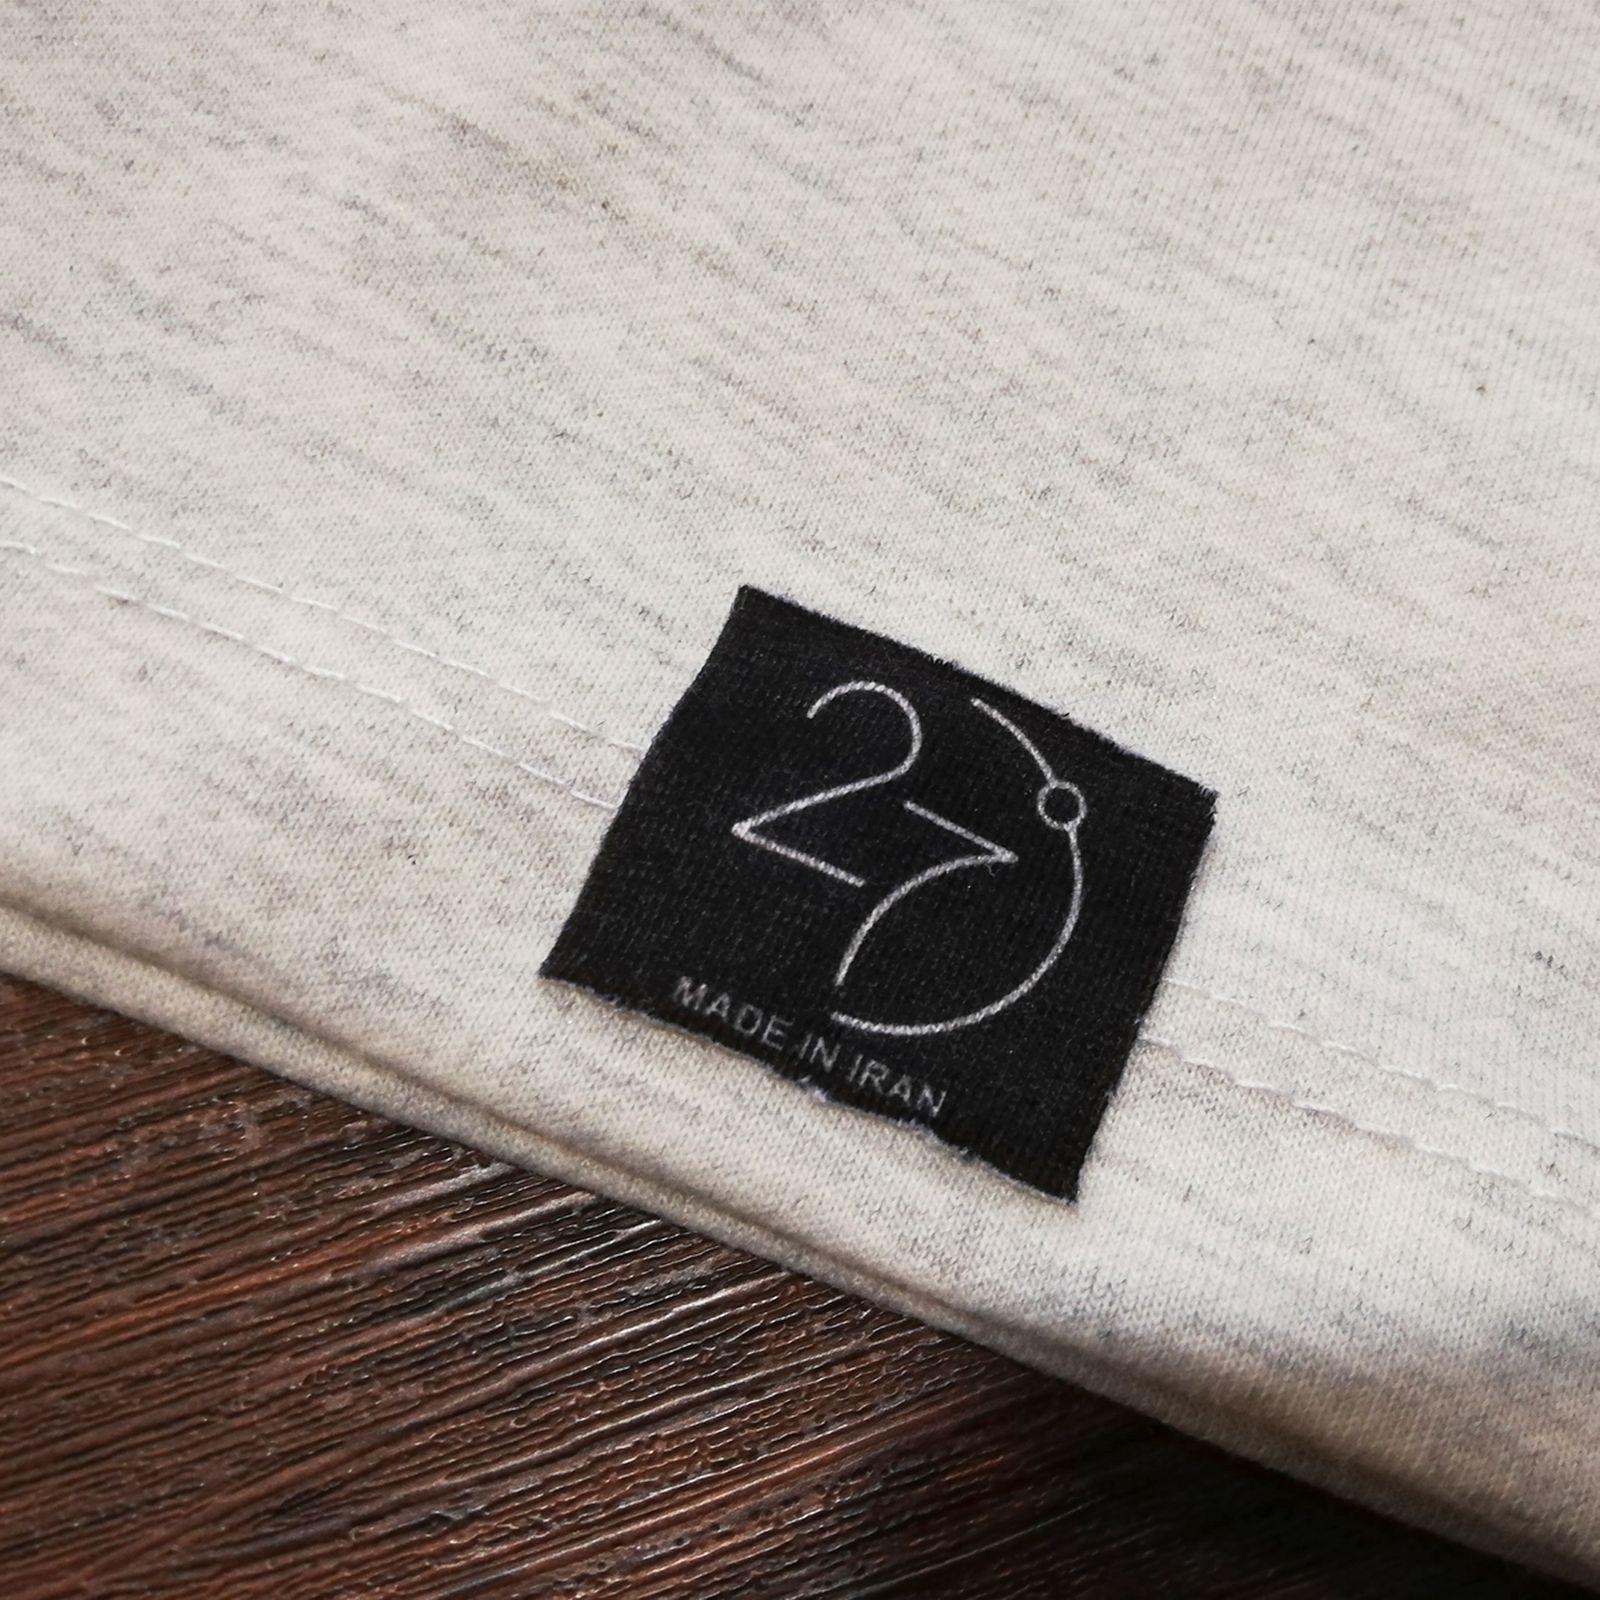 تیشرت زنانه 27 مدل بادکنک کد kP02 -  - 4